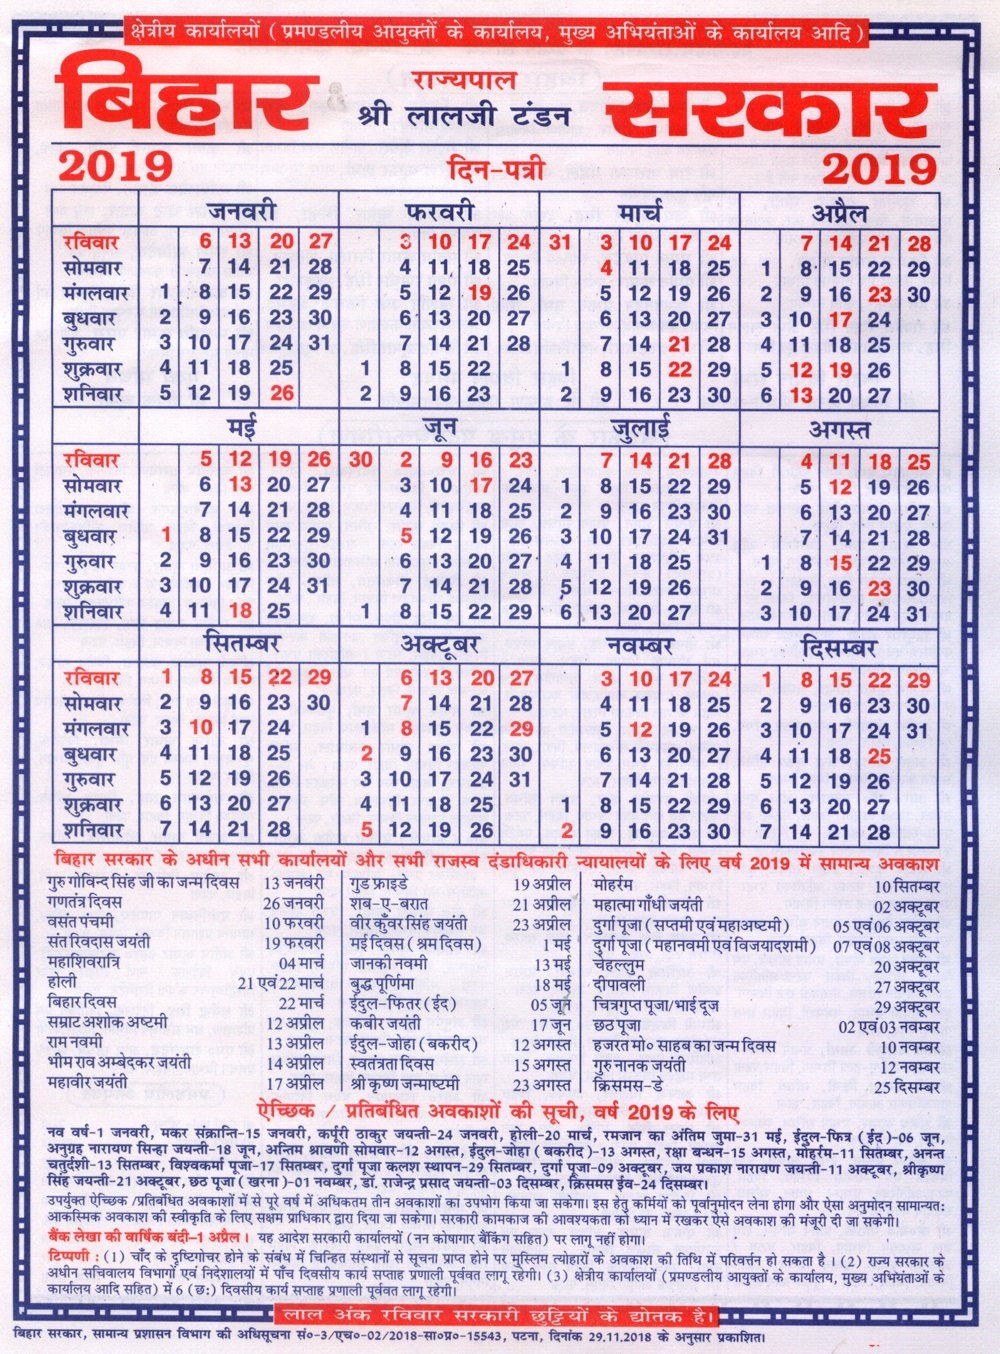 Bihar Govt. Calendar 2019, Bihar Govt. Holiday List, Holiday List Bihar Calendar 2019 Ke